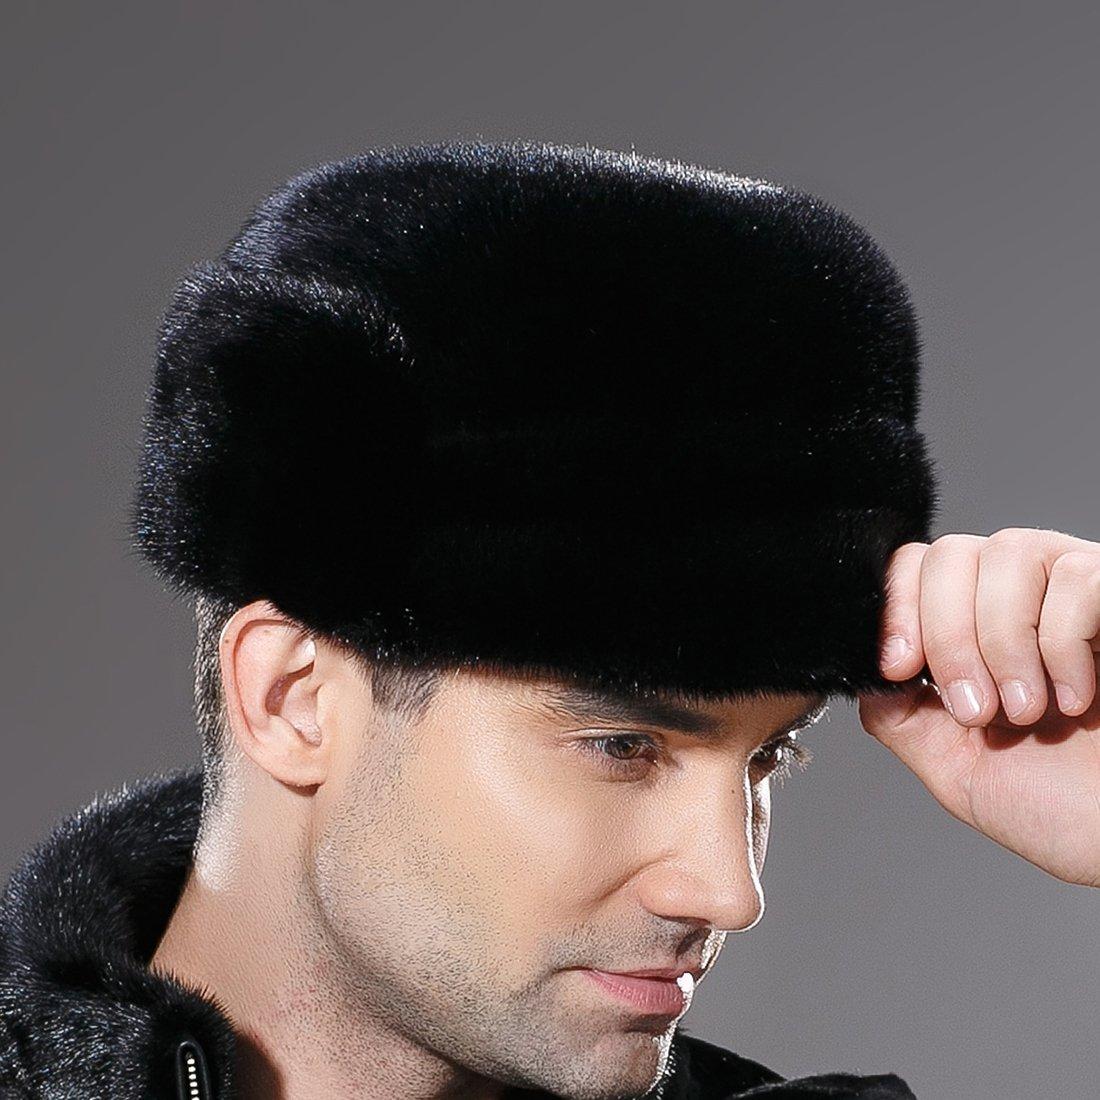 URSFUR Mne's Winter Fur Cap Genuine Mink Fur Fudd Hat Black M by URSFUR (Image #4)